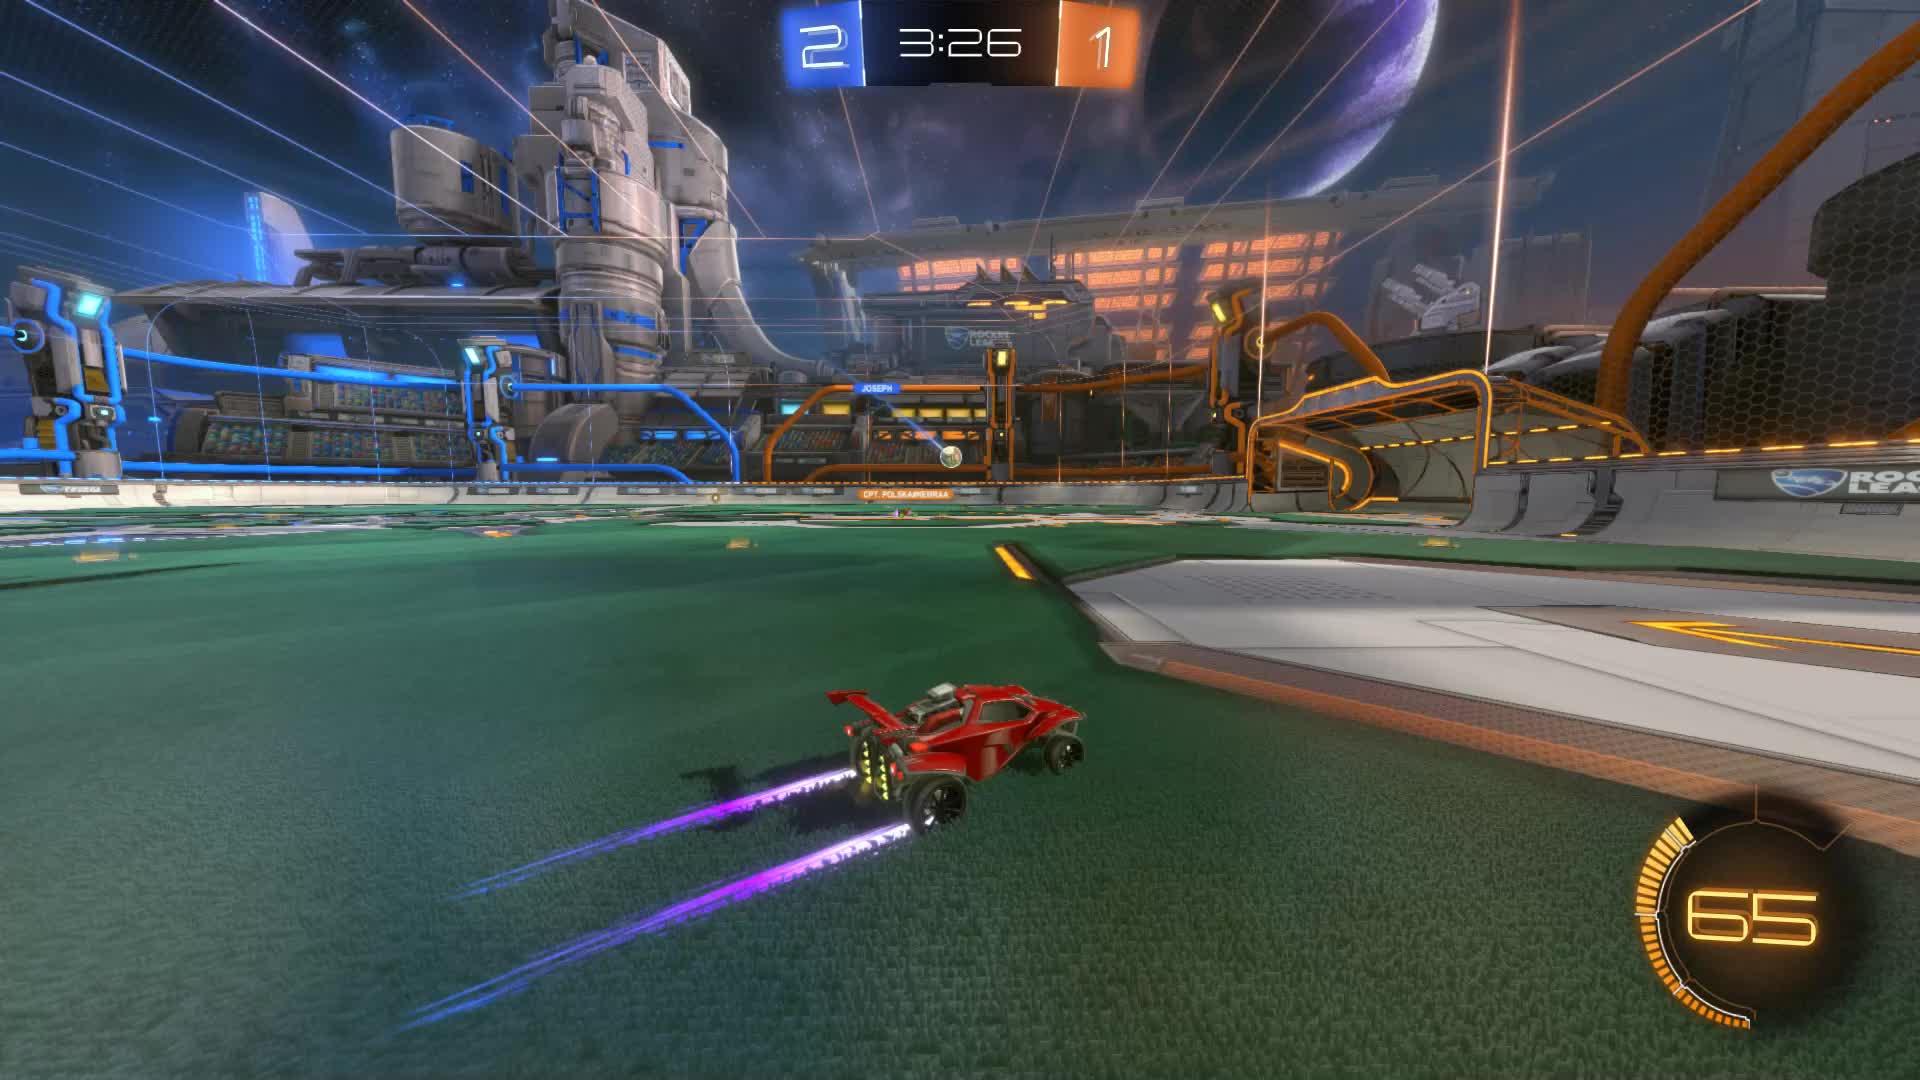 Gif Your Game, GifYourGame, Goal, Rocket League, RocketLeague, Squash, Goal 4: Squash GIFs